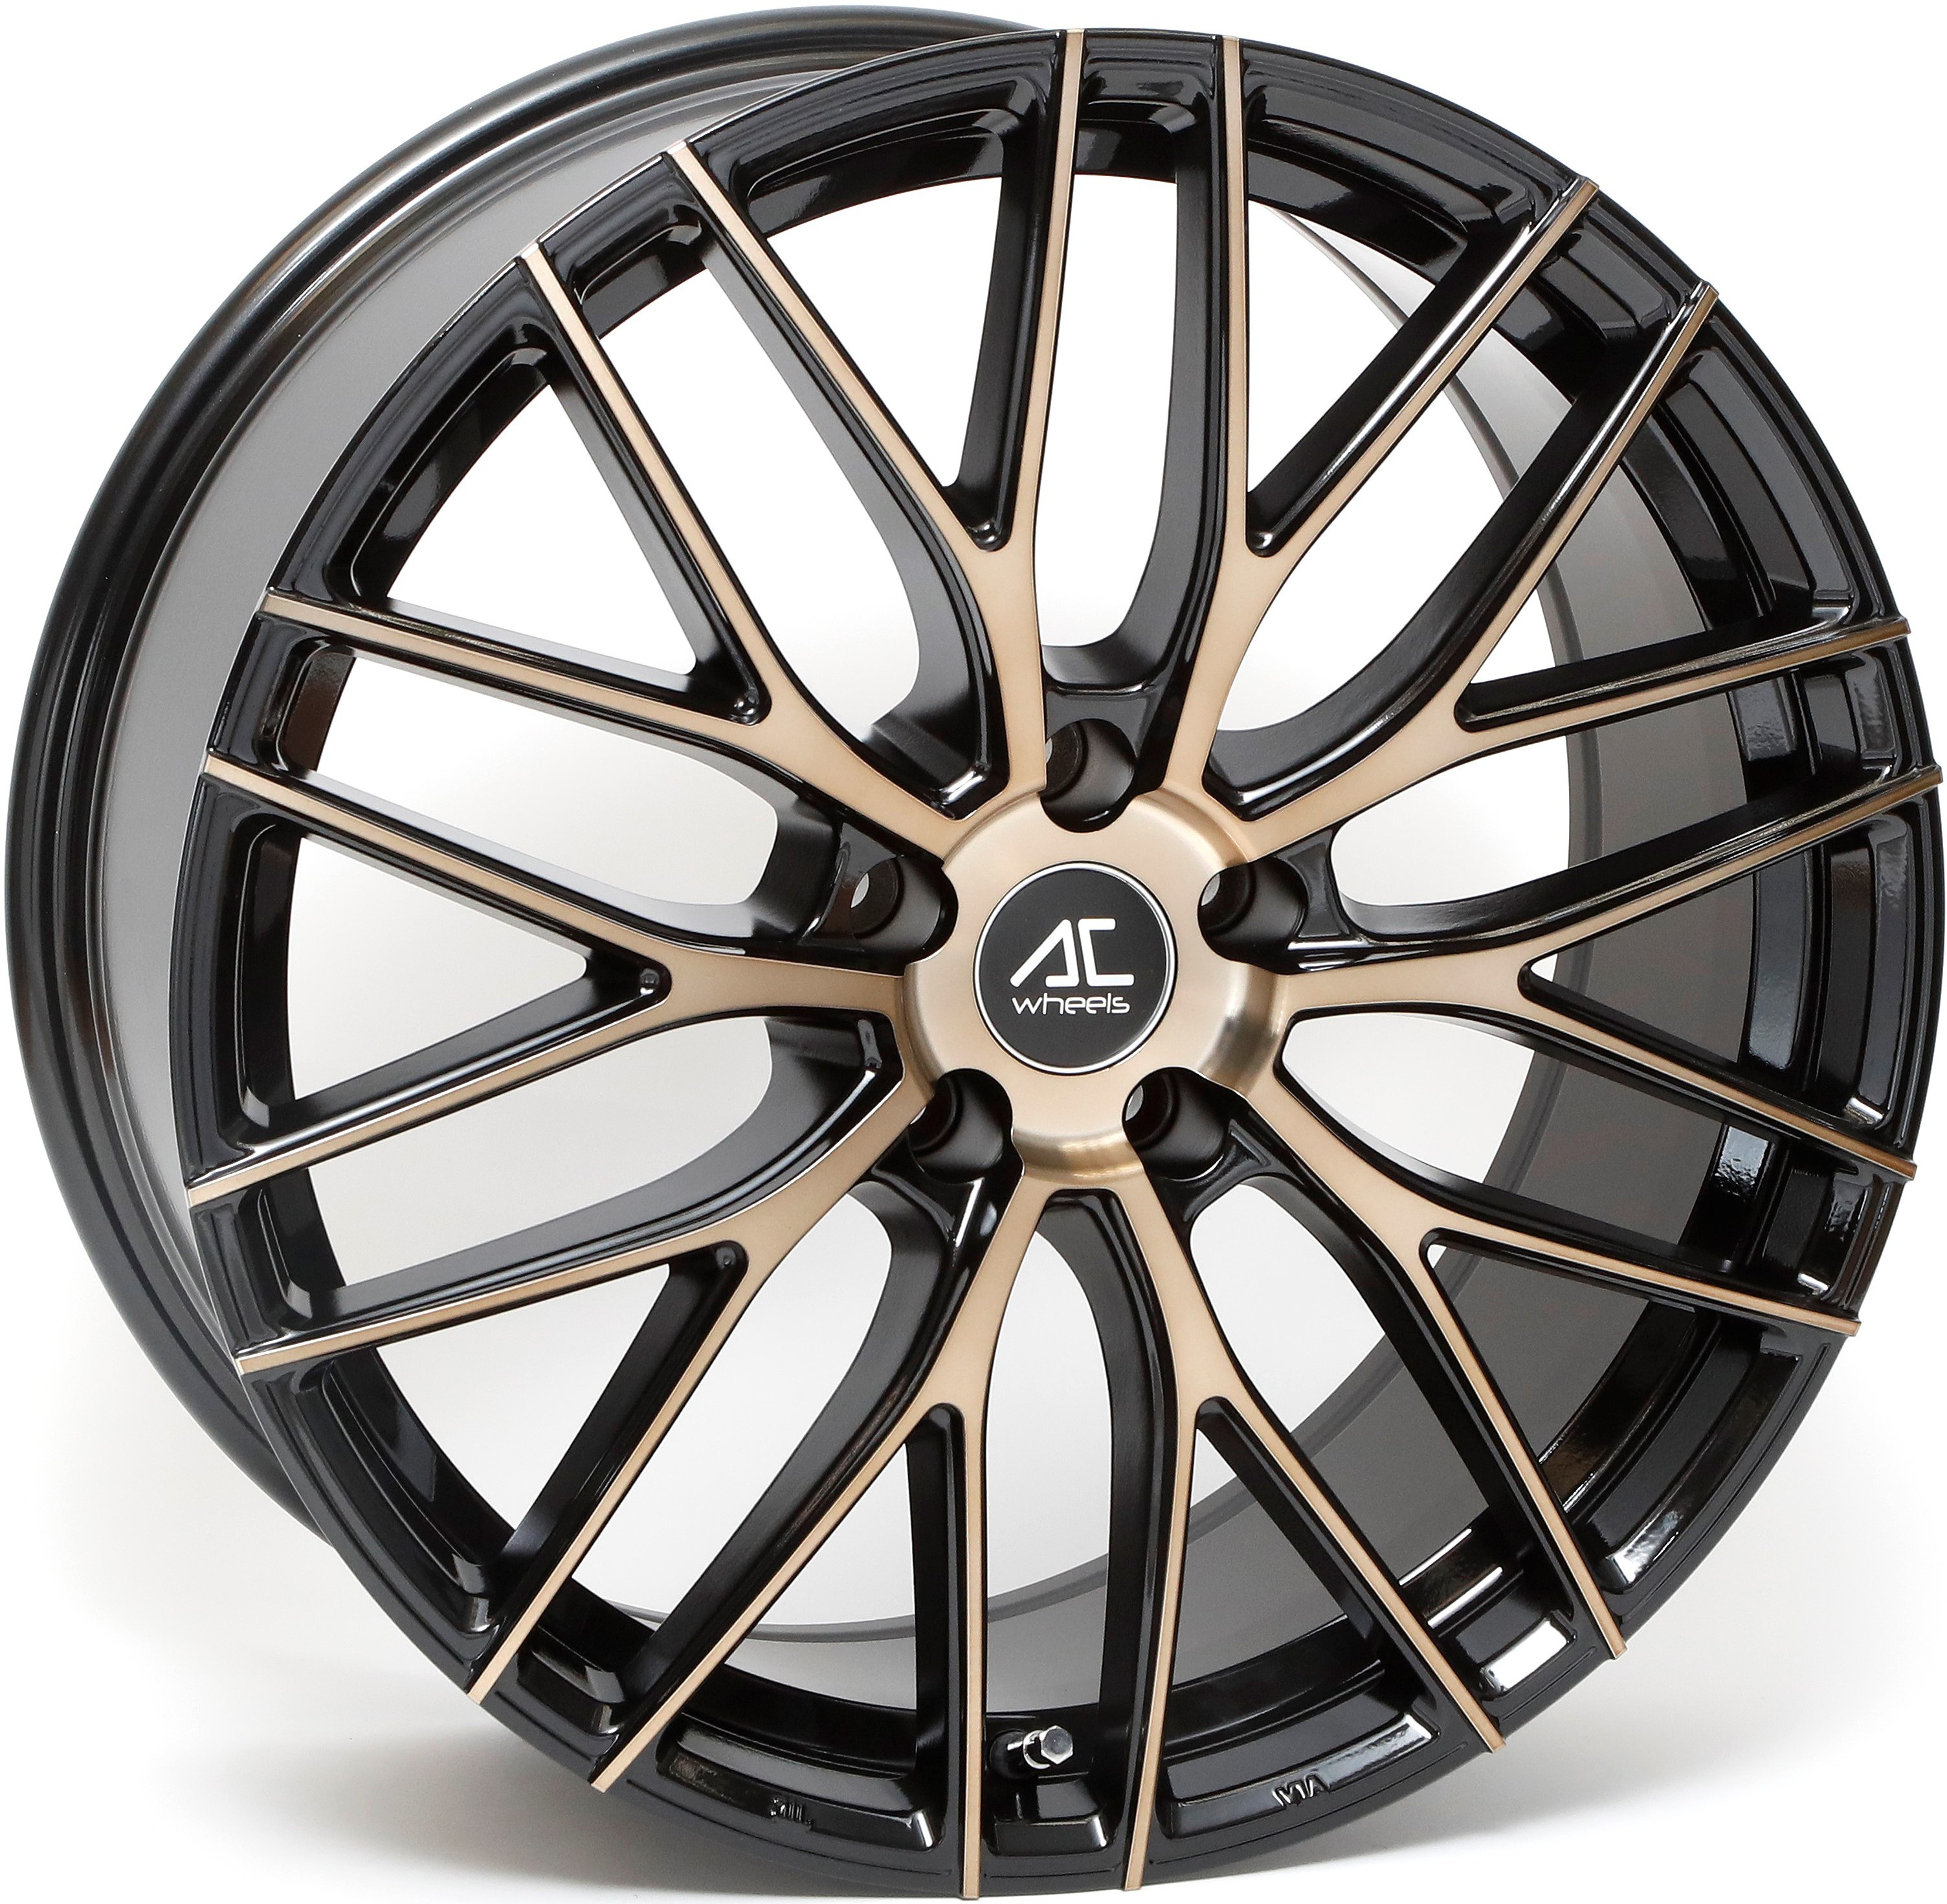 AC Wheels - Syclone (Black Polished Bronze)